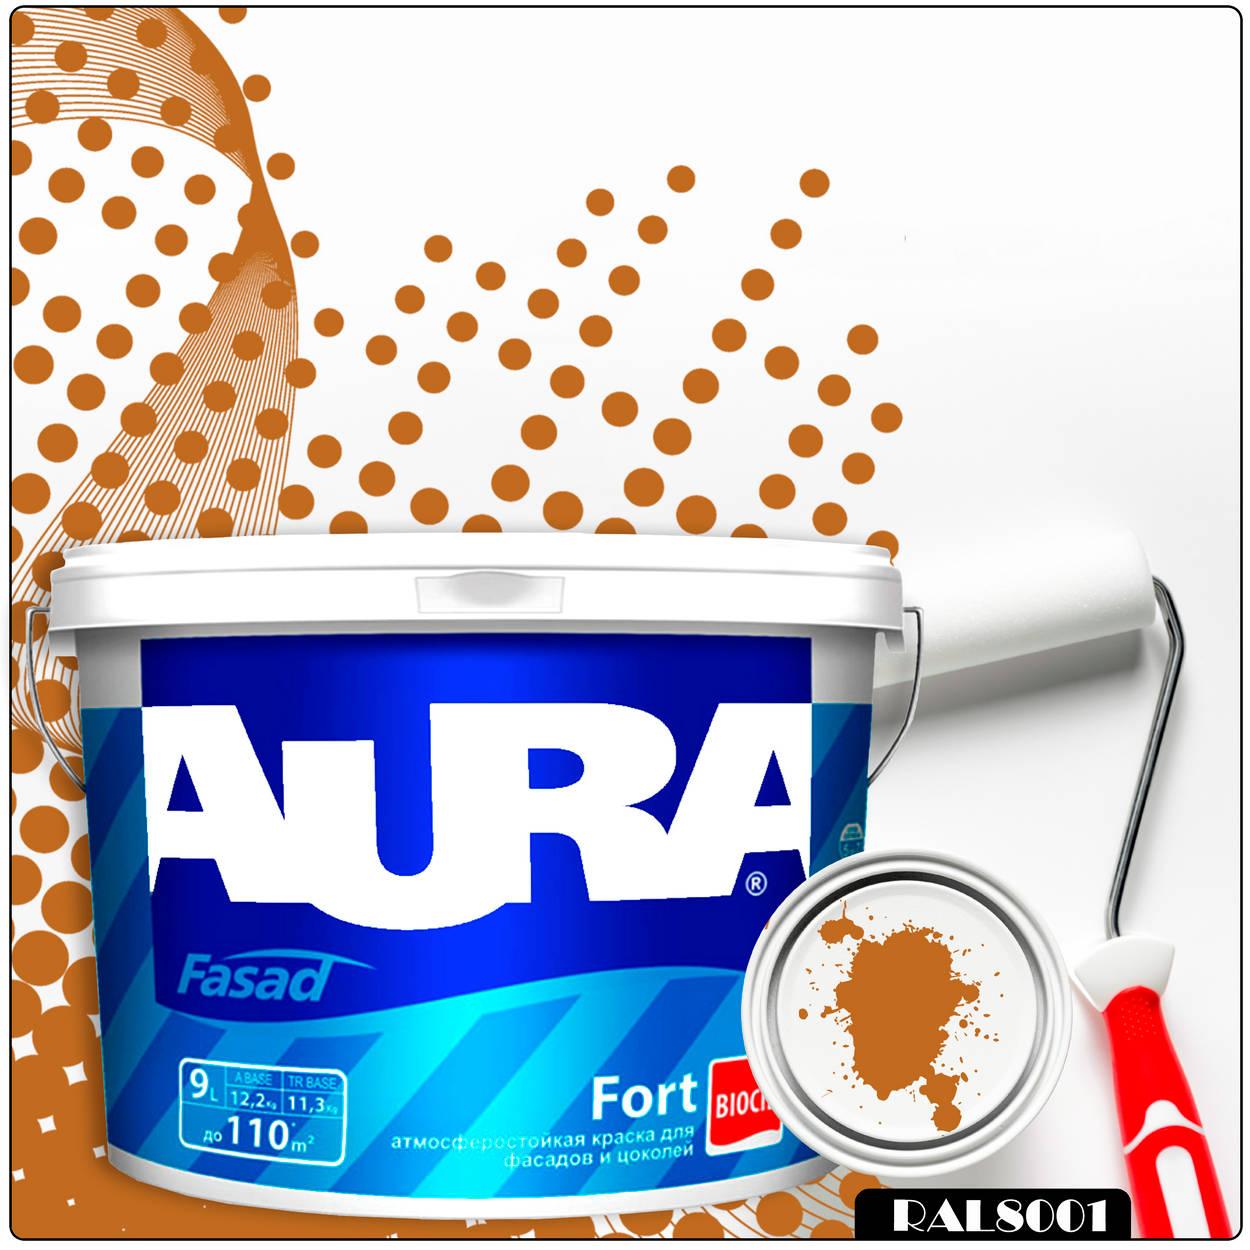 Фото 1 - Краска Aura Fasad Fort, RAL 8001 Коричневая охра, латексная, матовая, для фасада и цоколей, 9л, Аура.